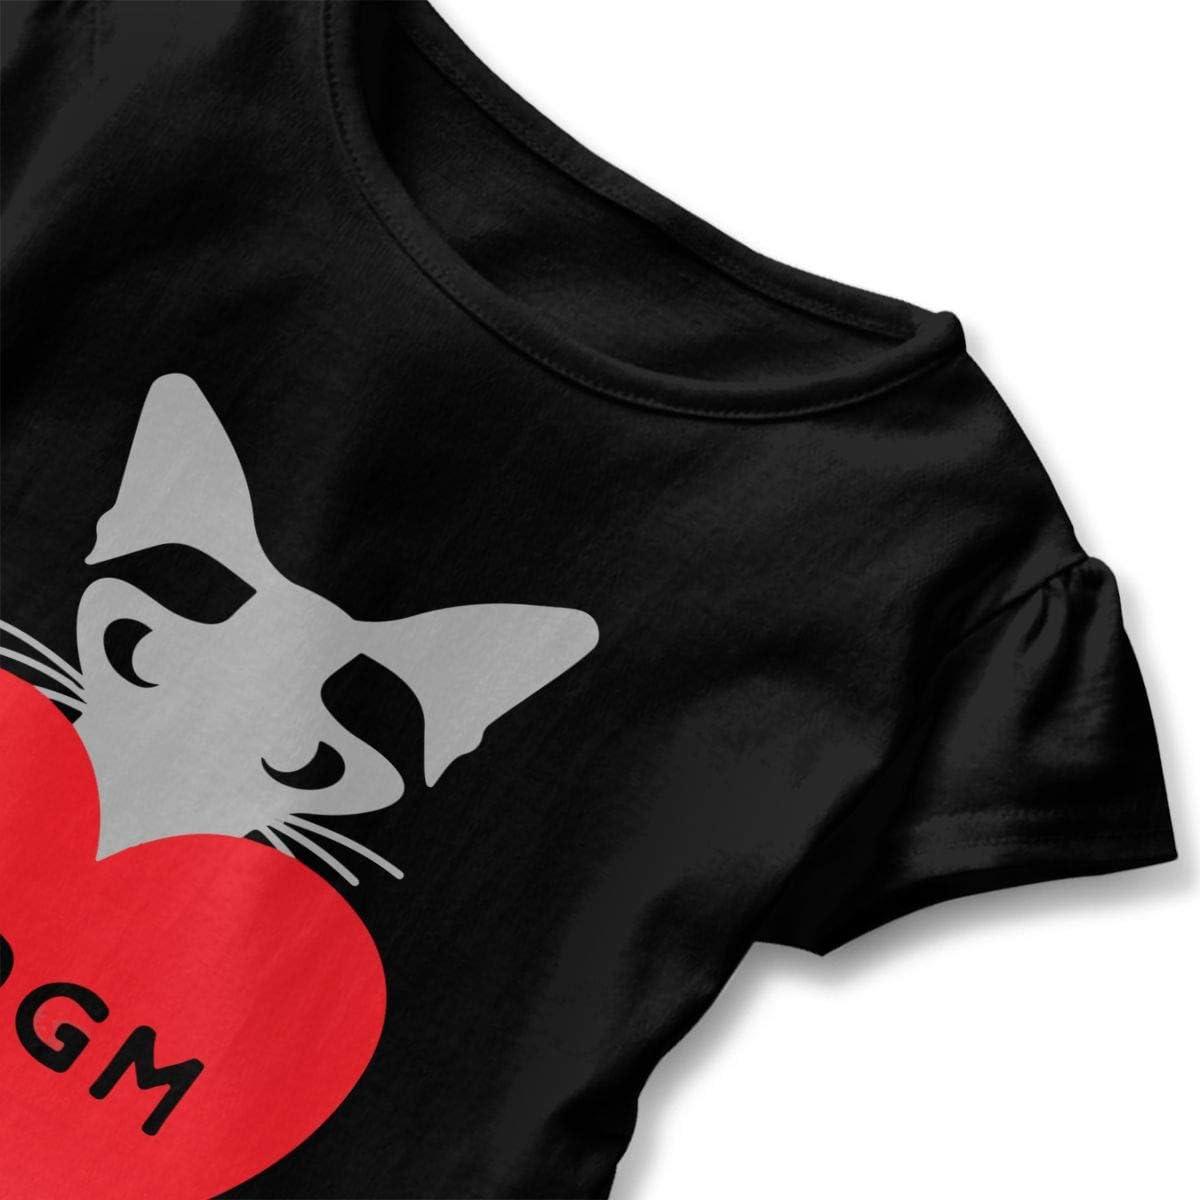 26NSHIRT Elvis SAYS SSDGM-1 Toddler Girls Short Sleeve Graphic Shirts